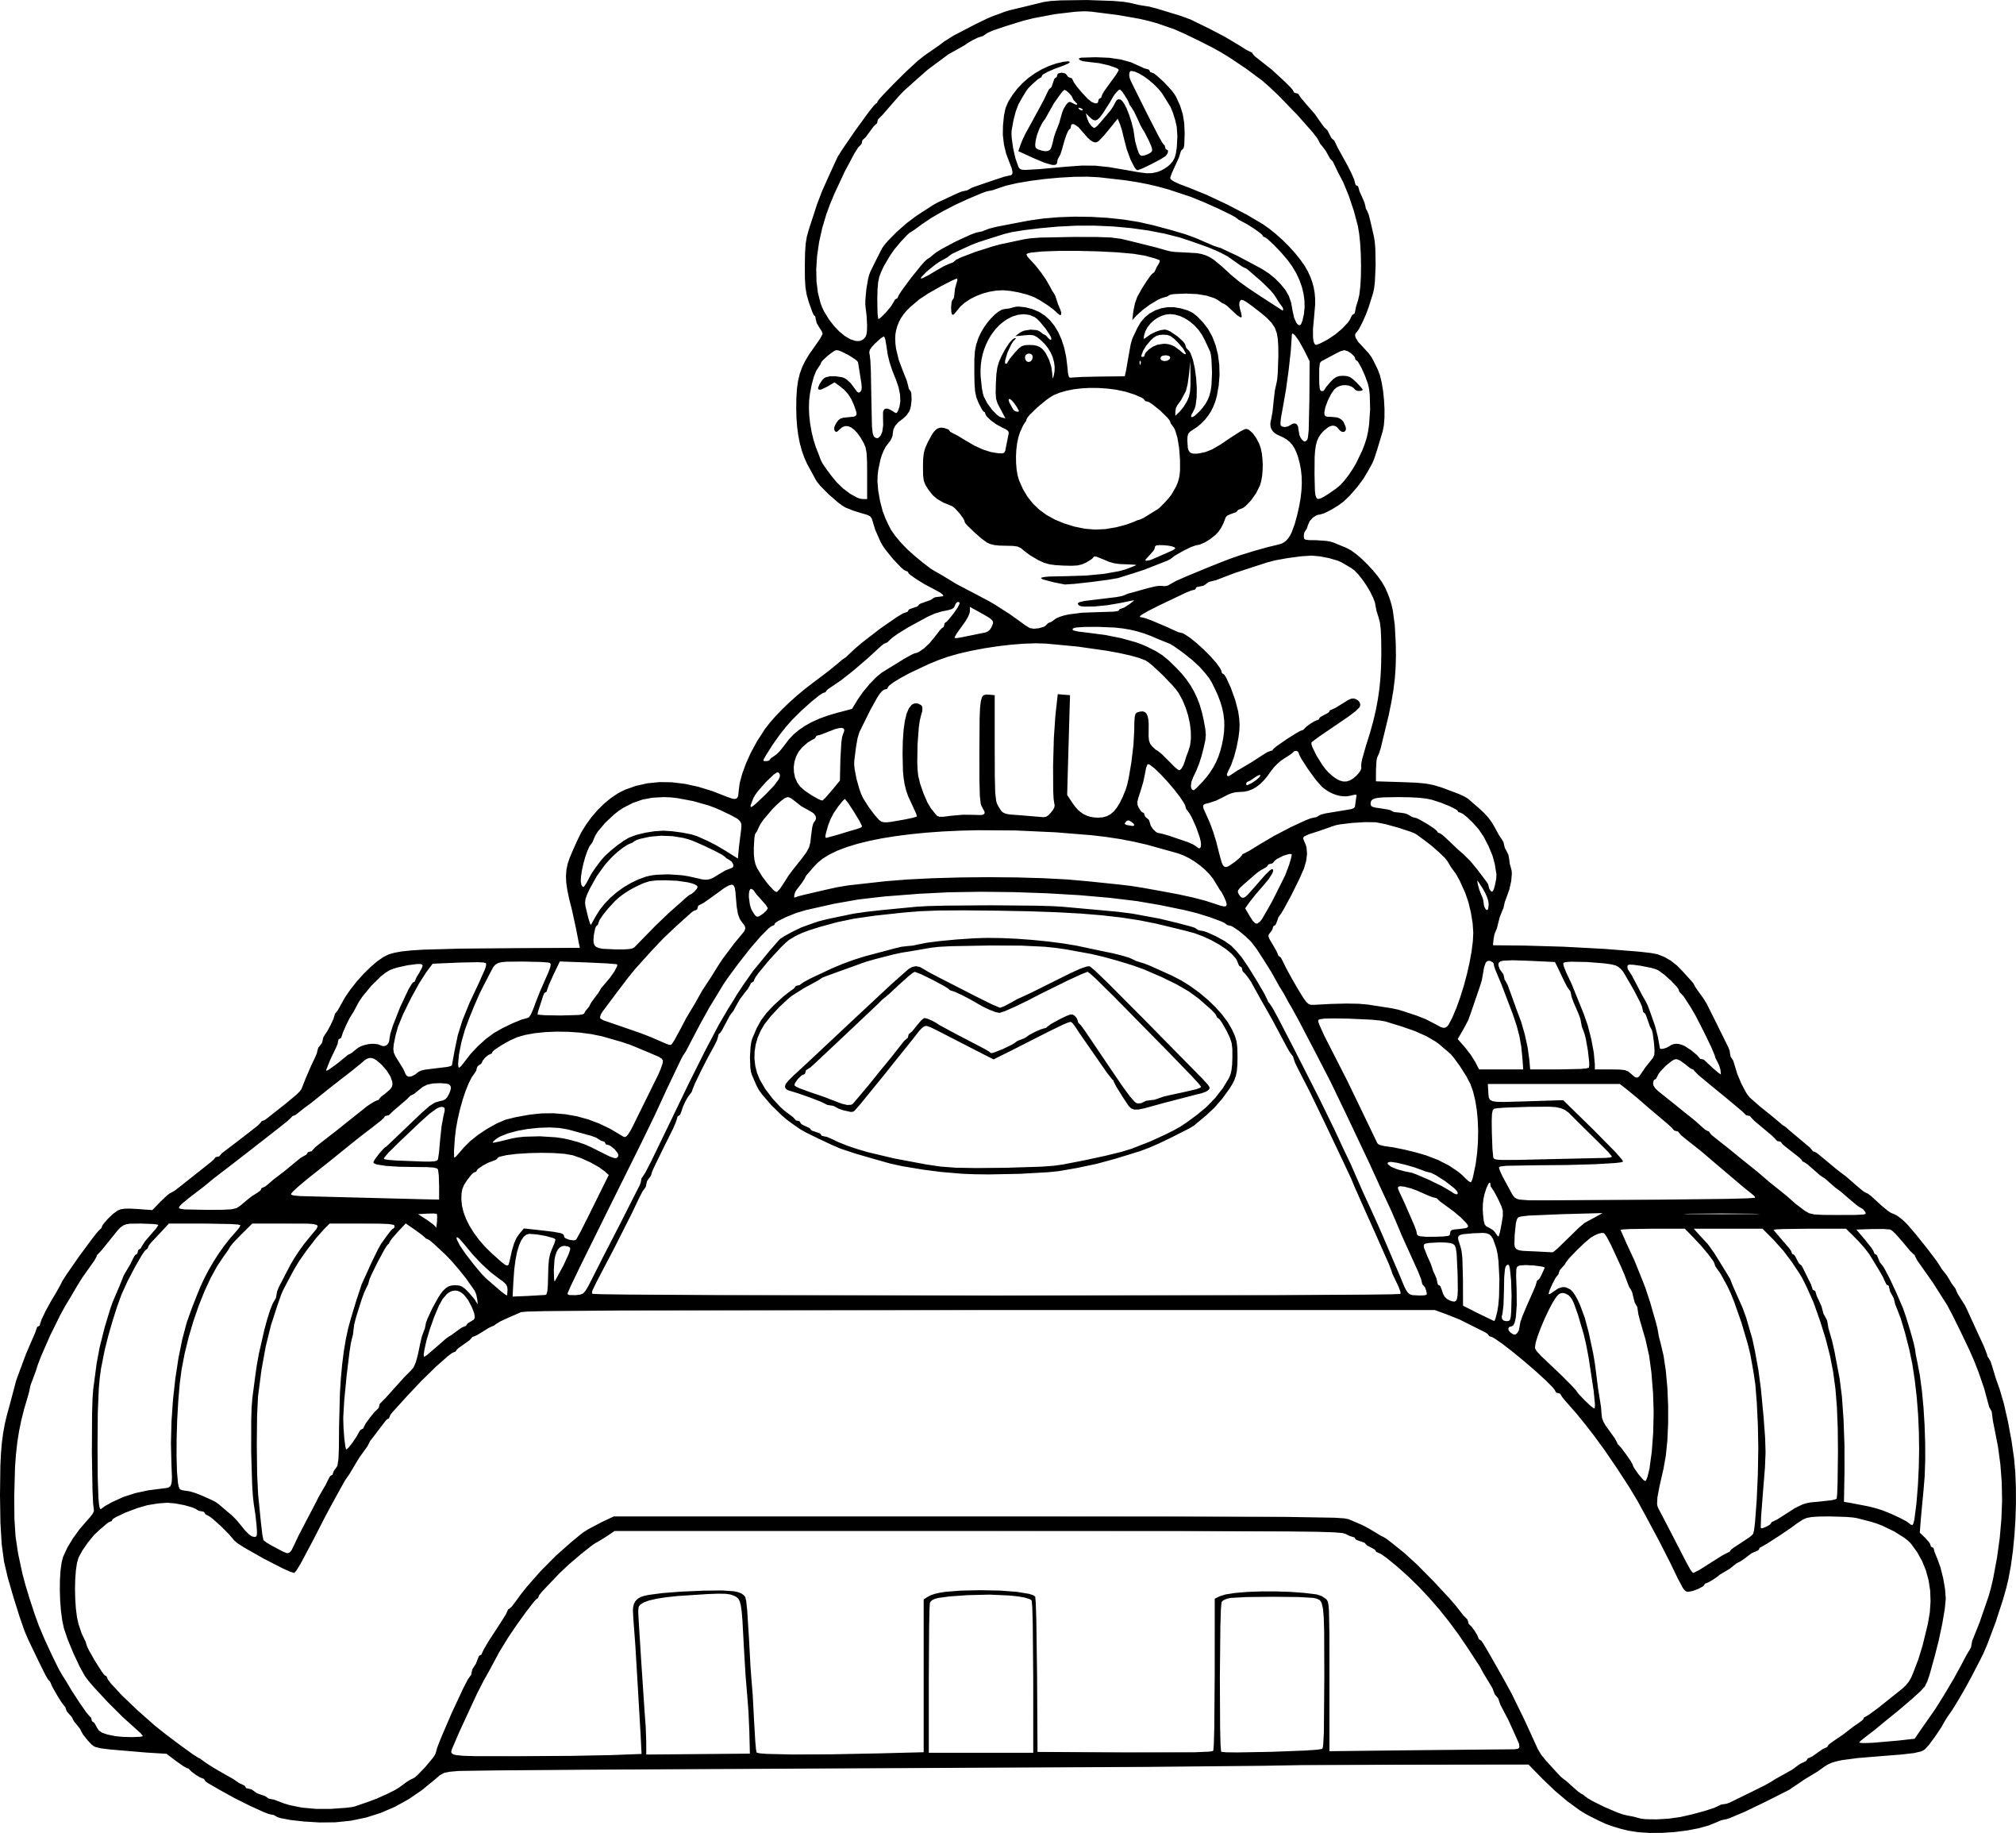 Mario Kart 8 Drawings Free Download On Clipartmag